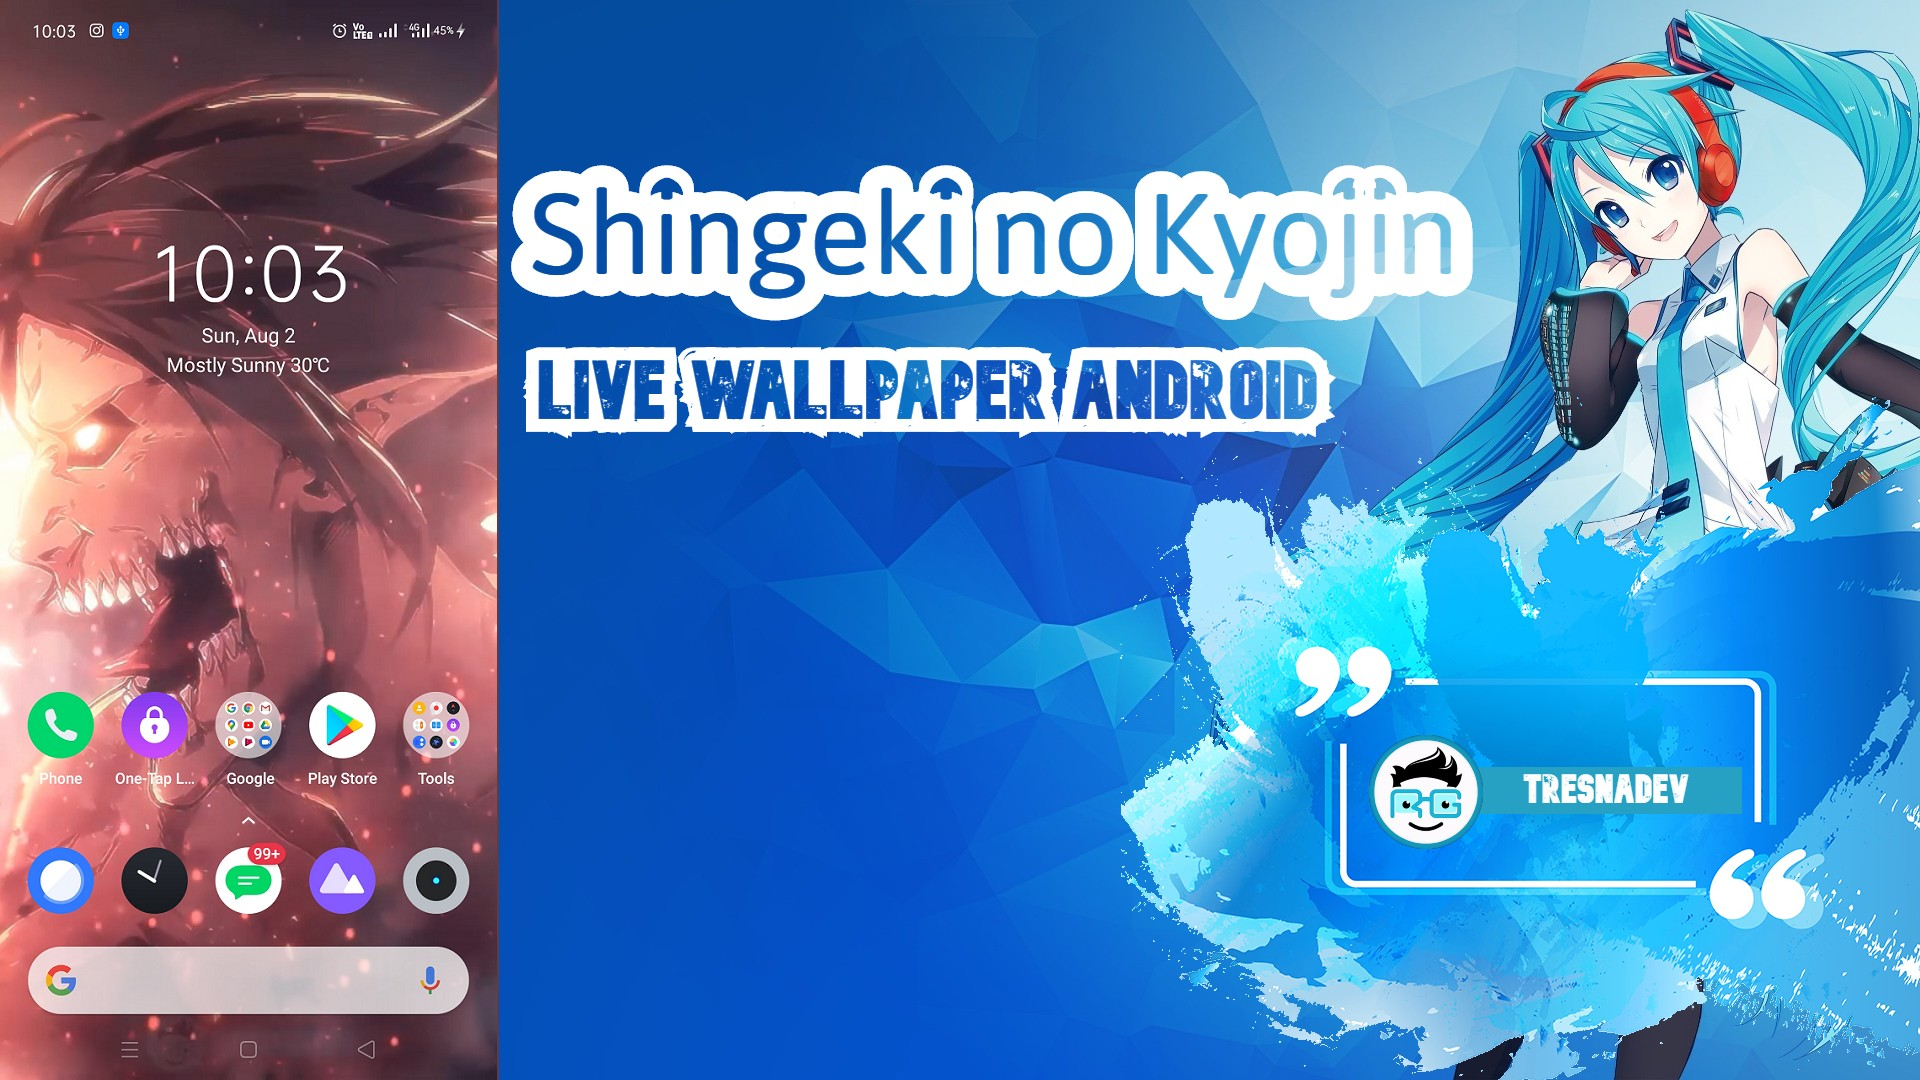 Shingeki No Kyojin Live Wallpaper Android Tresnadev